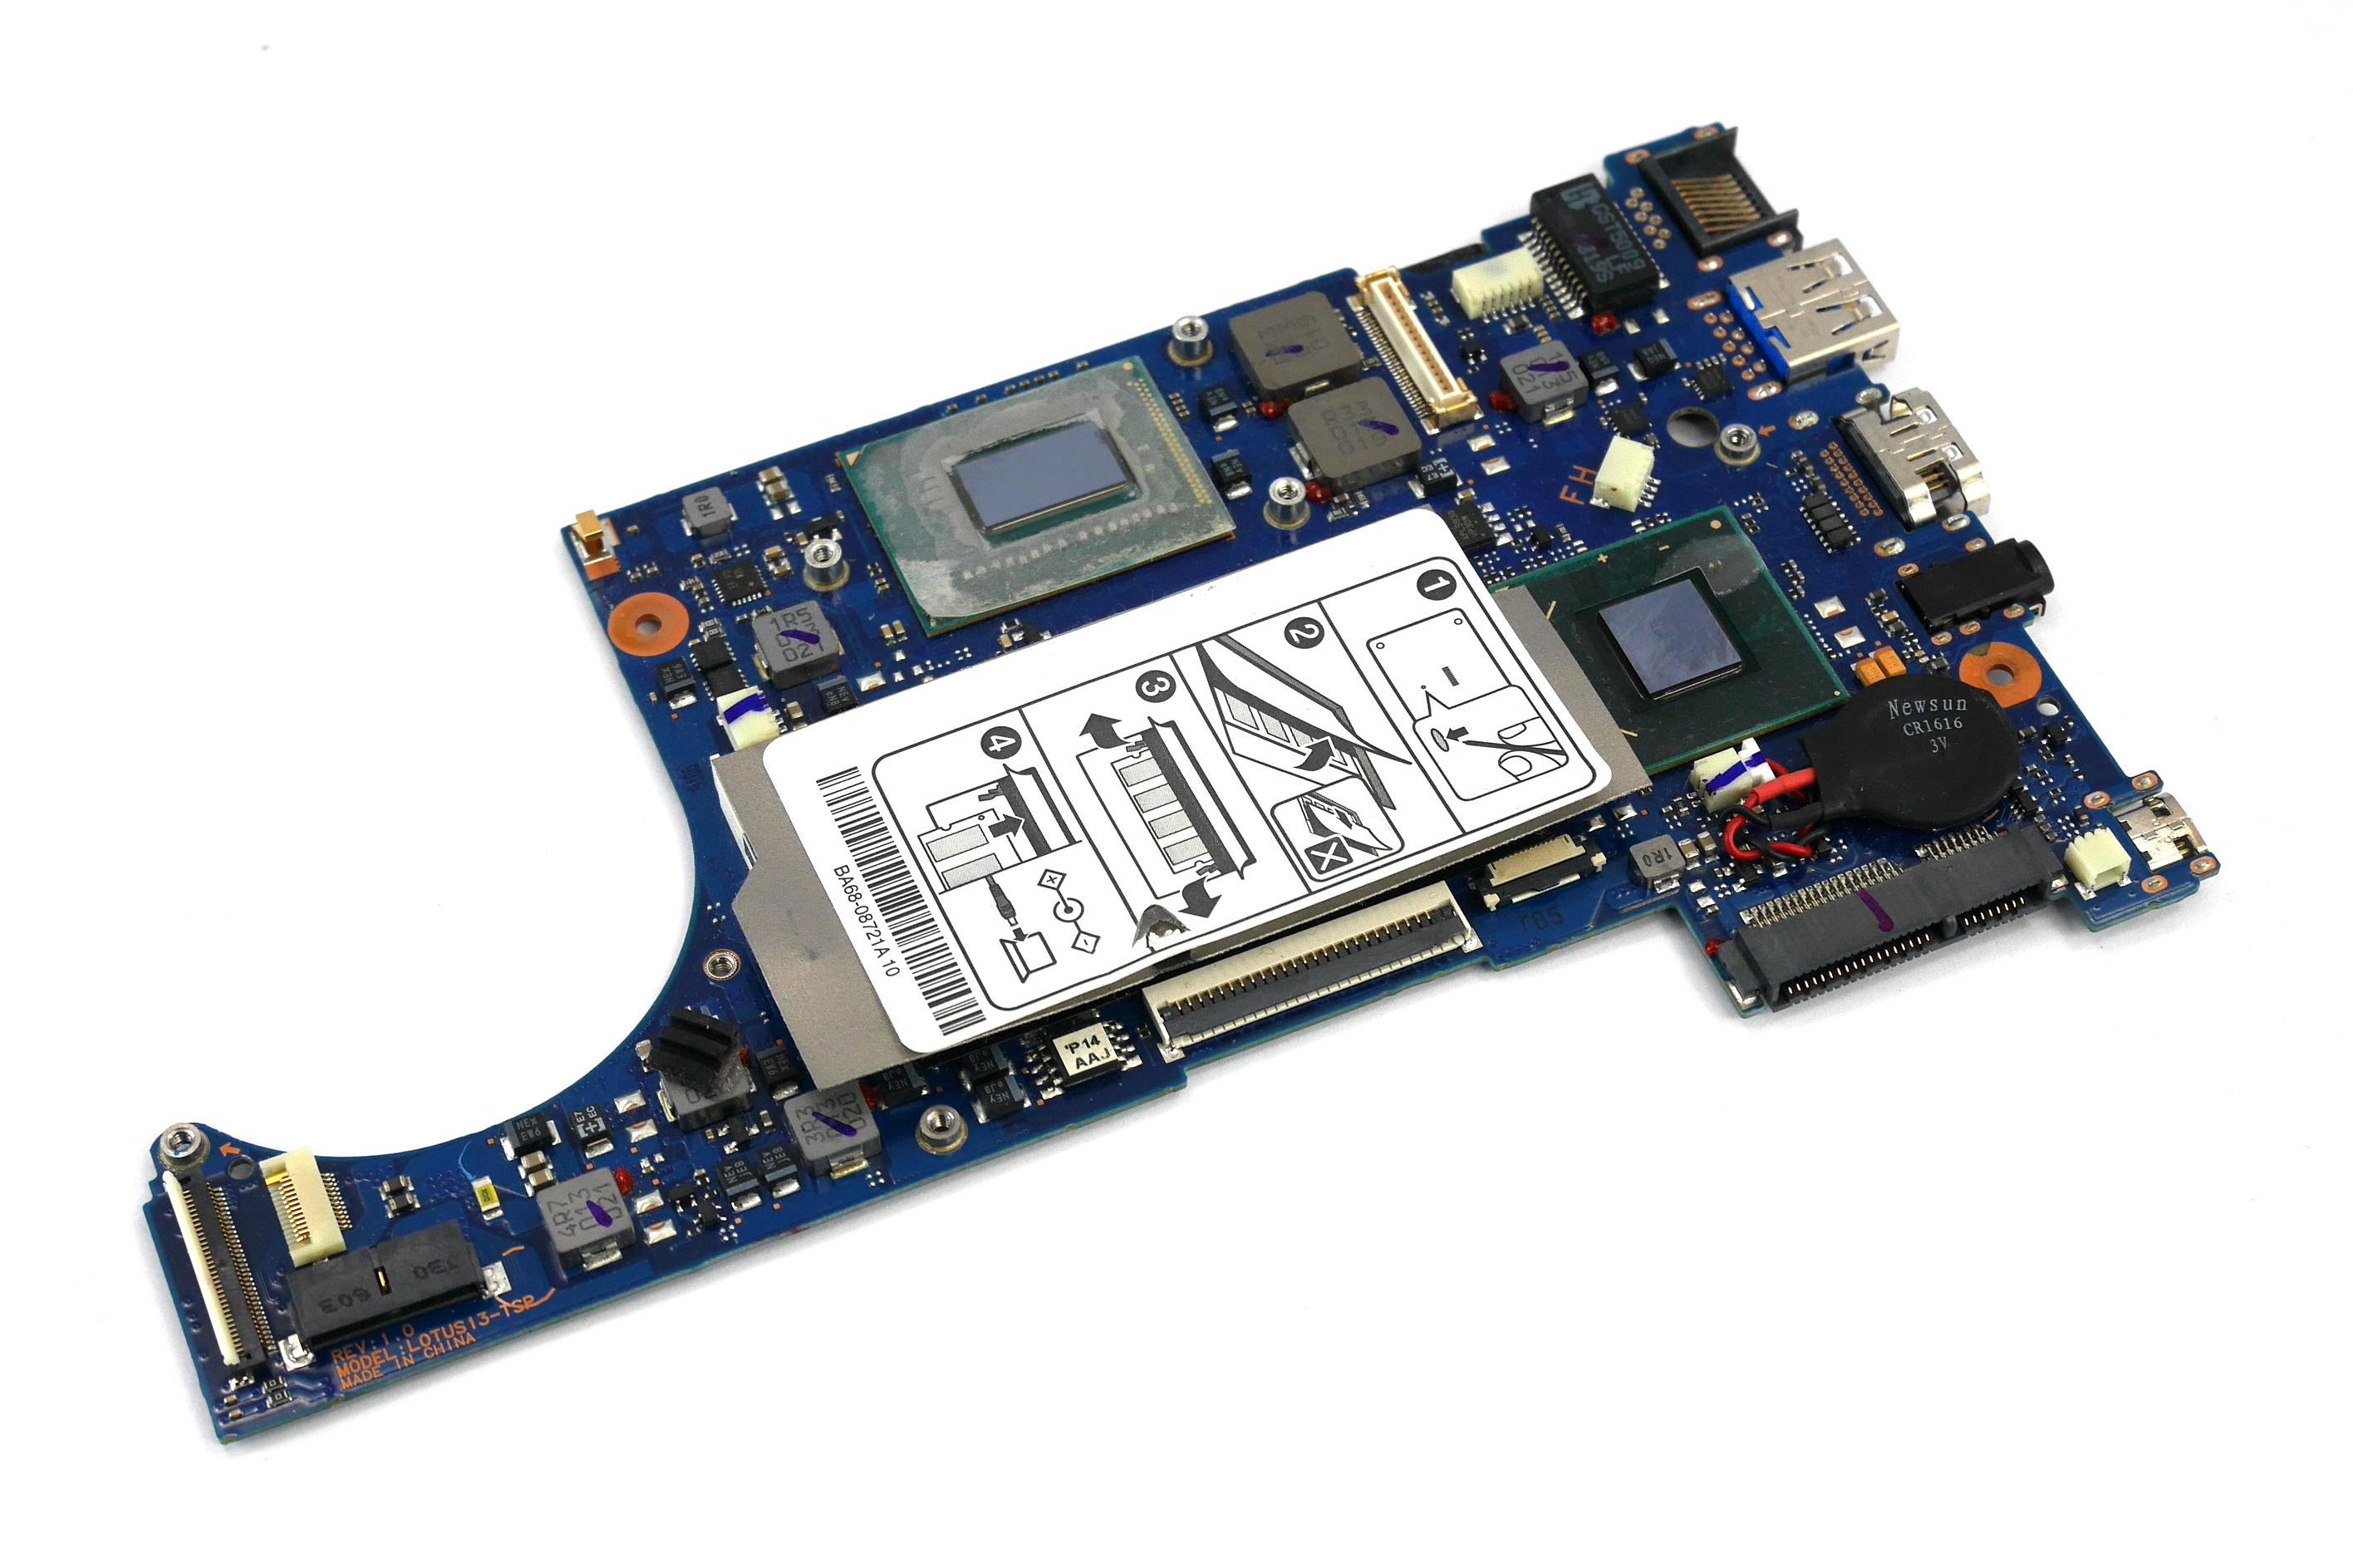 Samsung BA92-10444 530U NP530U3C Motherboard with Intel Core i5-3317U CPU